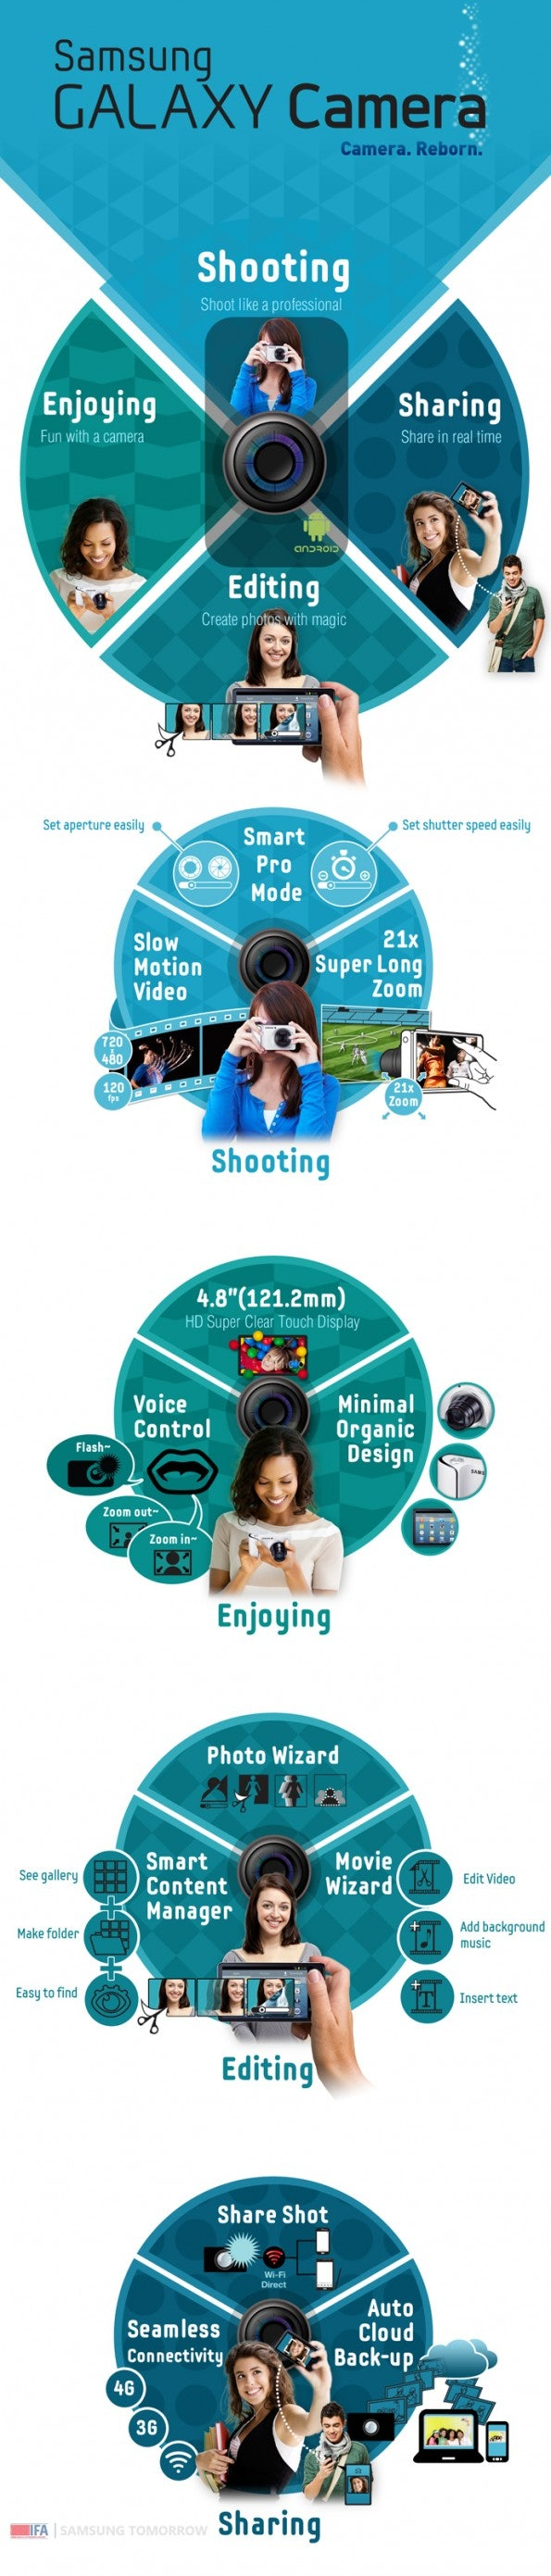 http://t3n.de/news/wp-content/uploads/2012/08/IFA2012_galaxy-camera_info-595x2782.jpeg